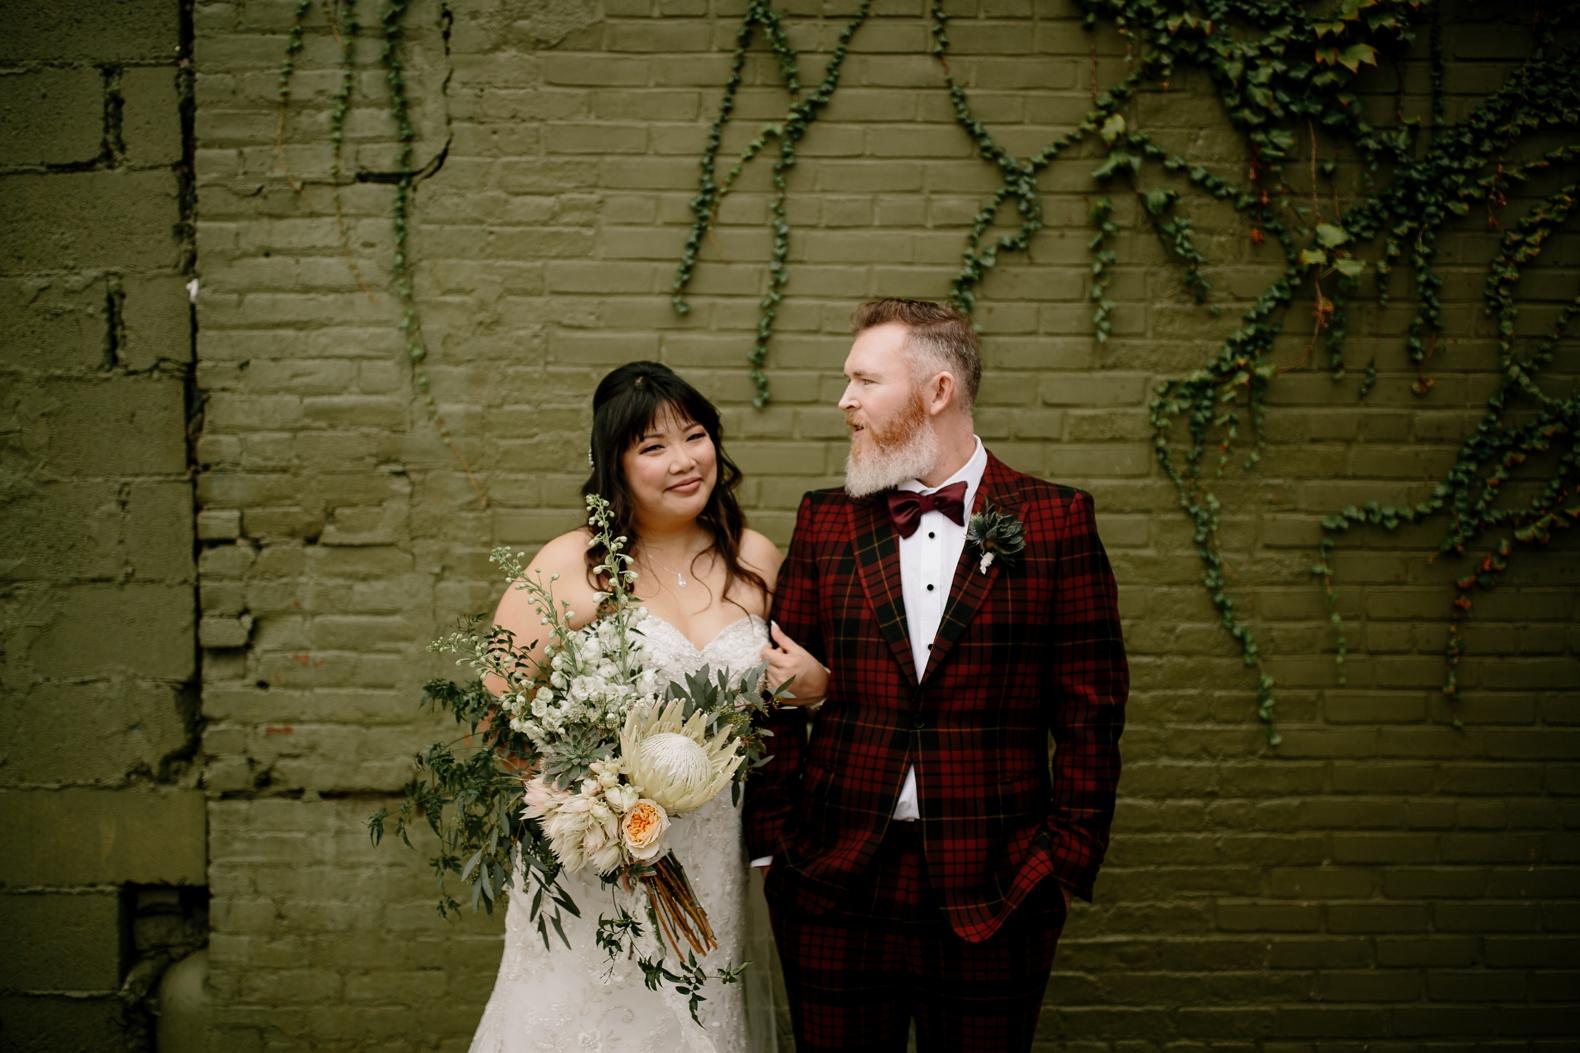 501-union-wedding-0044